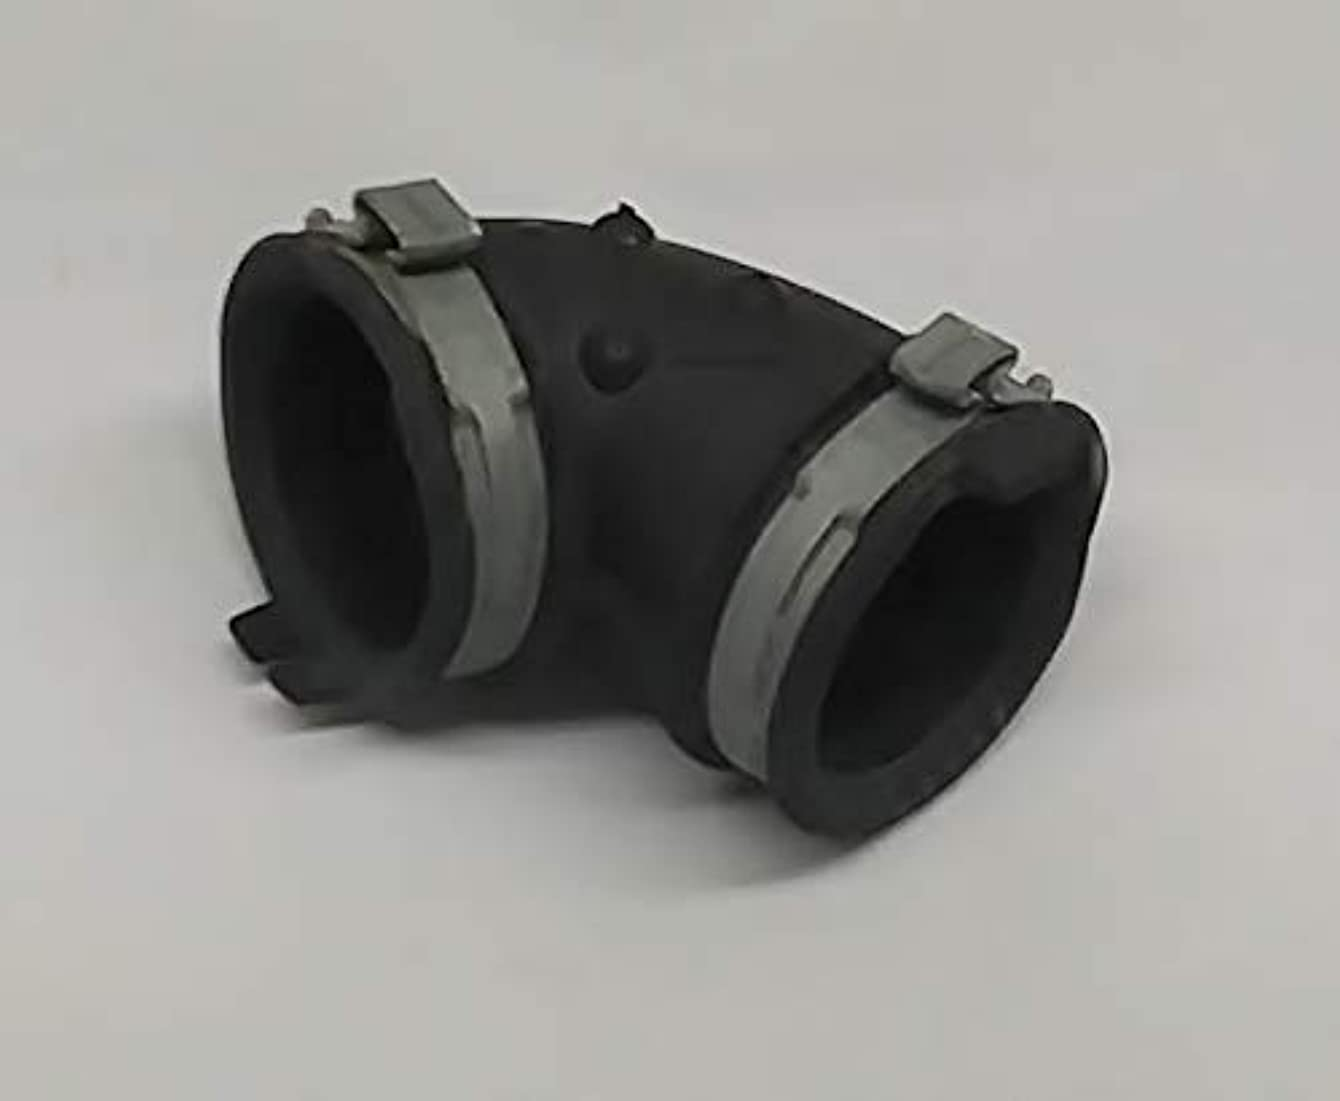 W10445975 Dishwasher Circulation Pump to Sump Hose - Genuine OEM